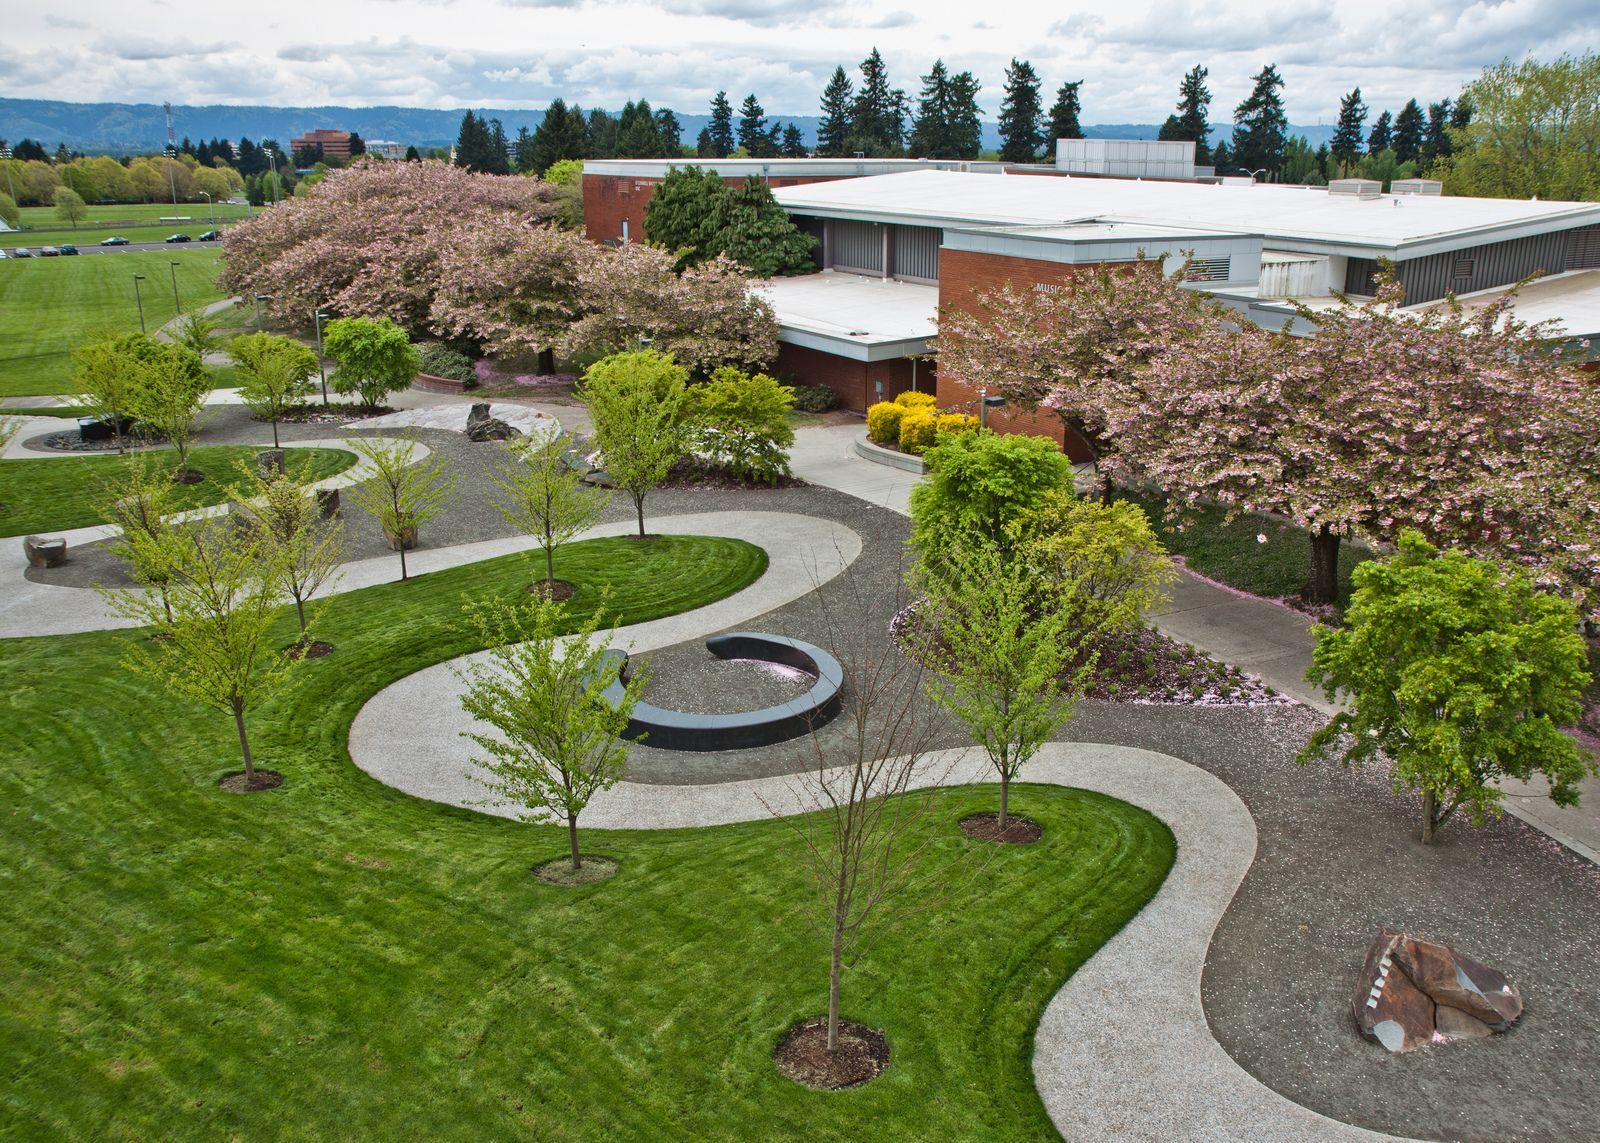 Royce E Pollard Japanese Friendship Garden Landscape 400 x 300